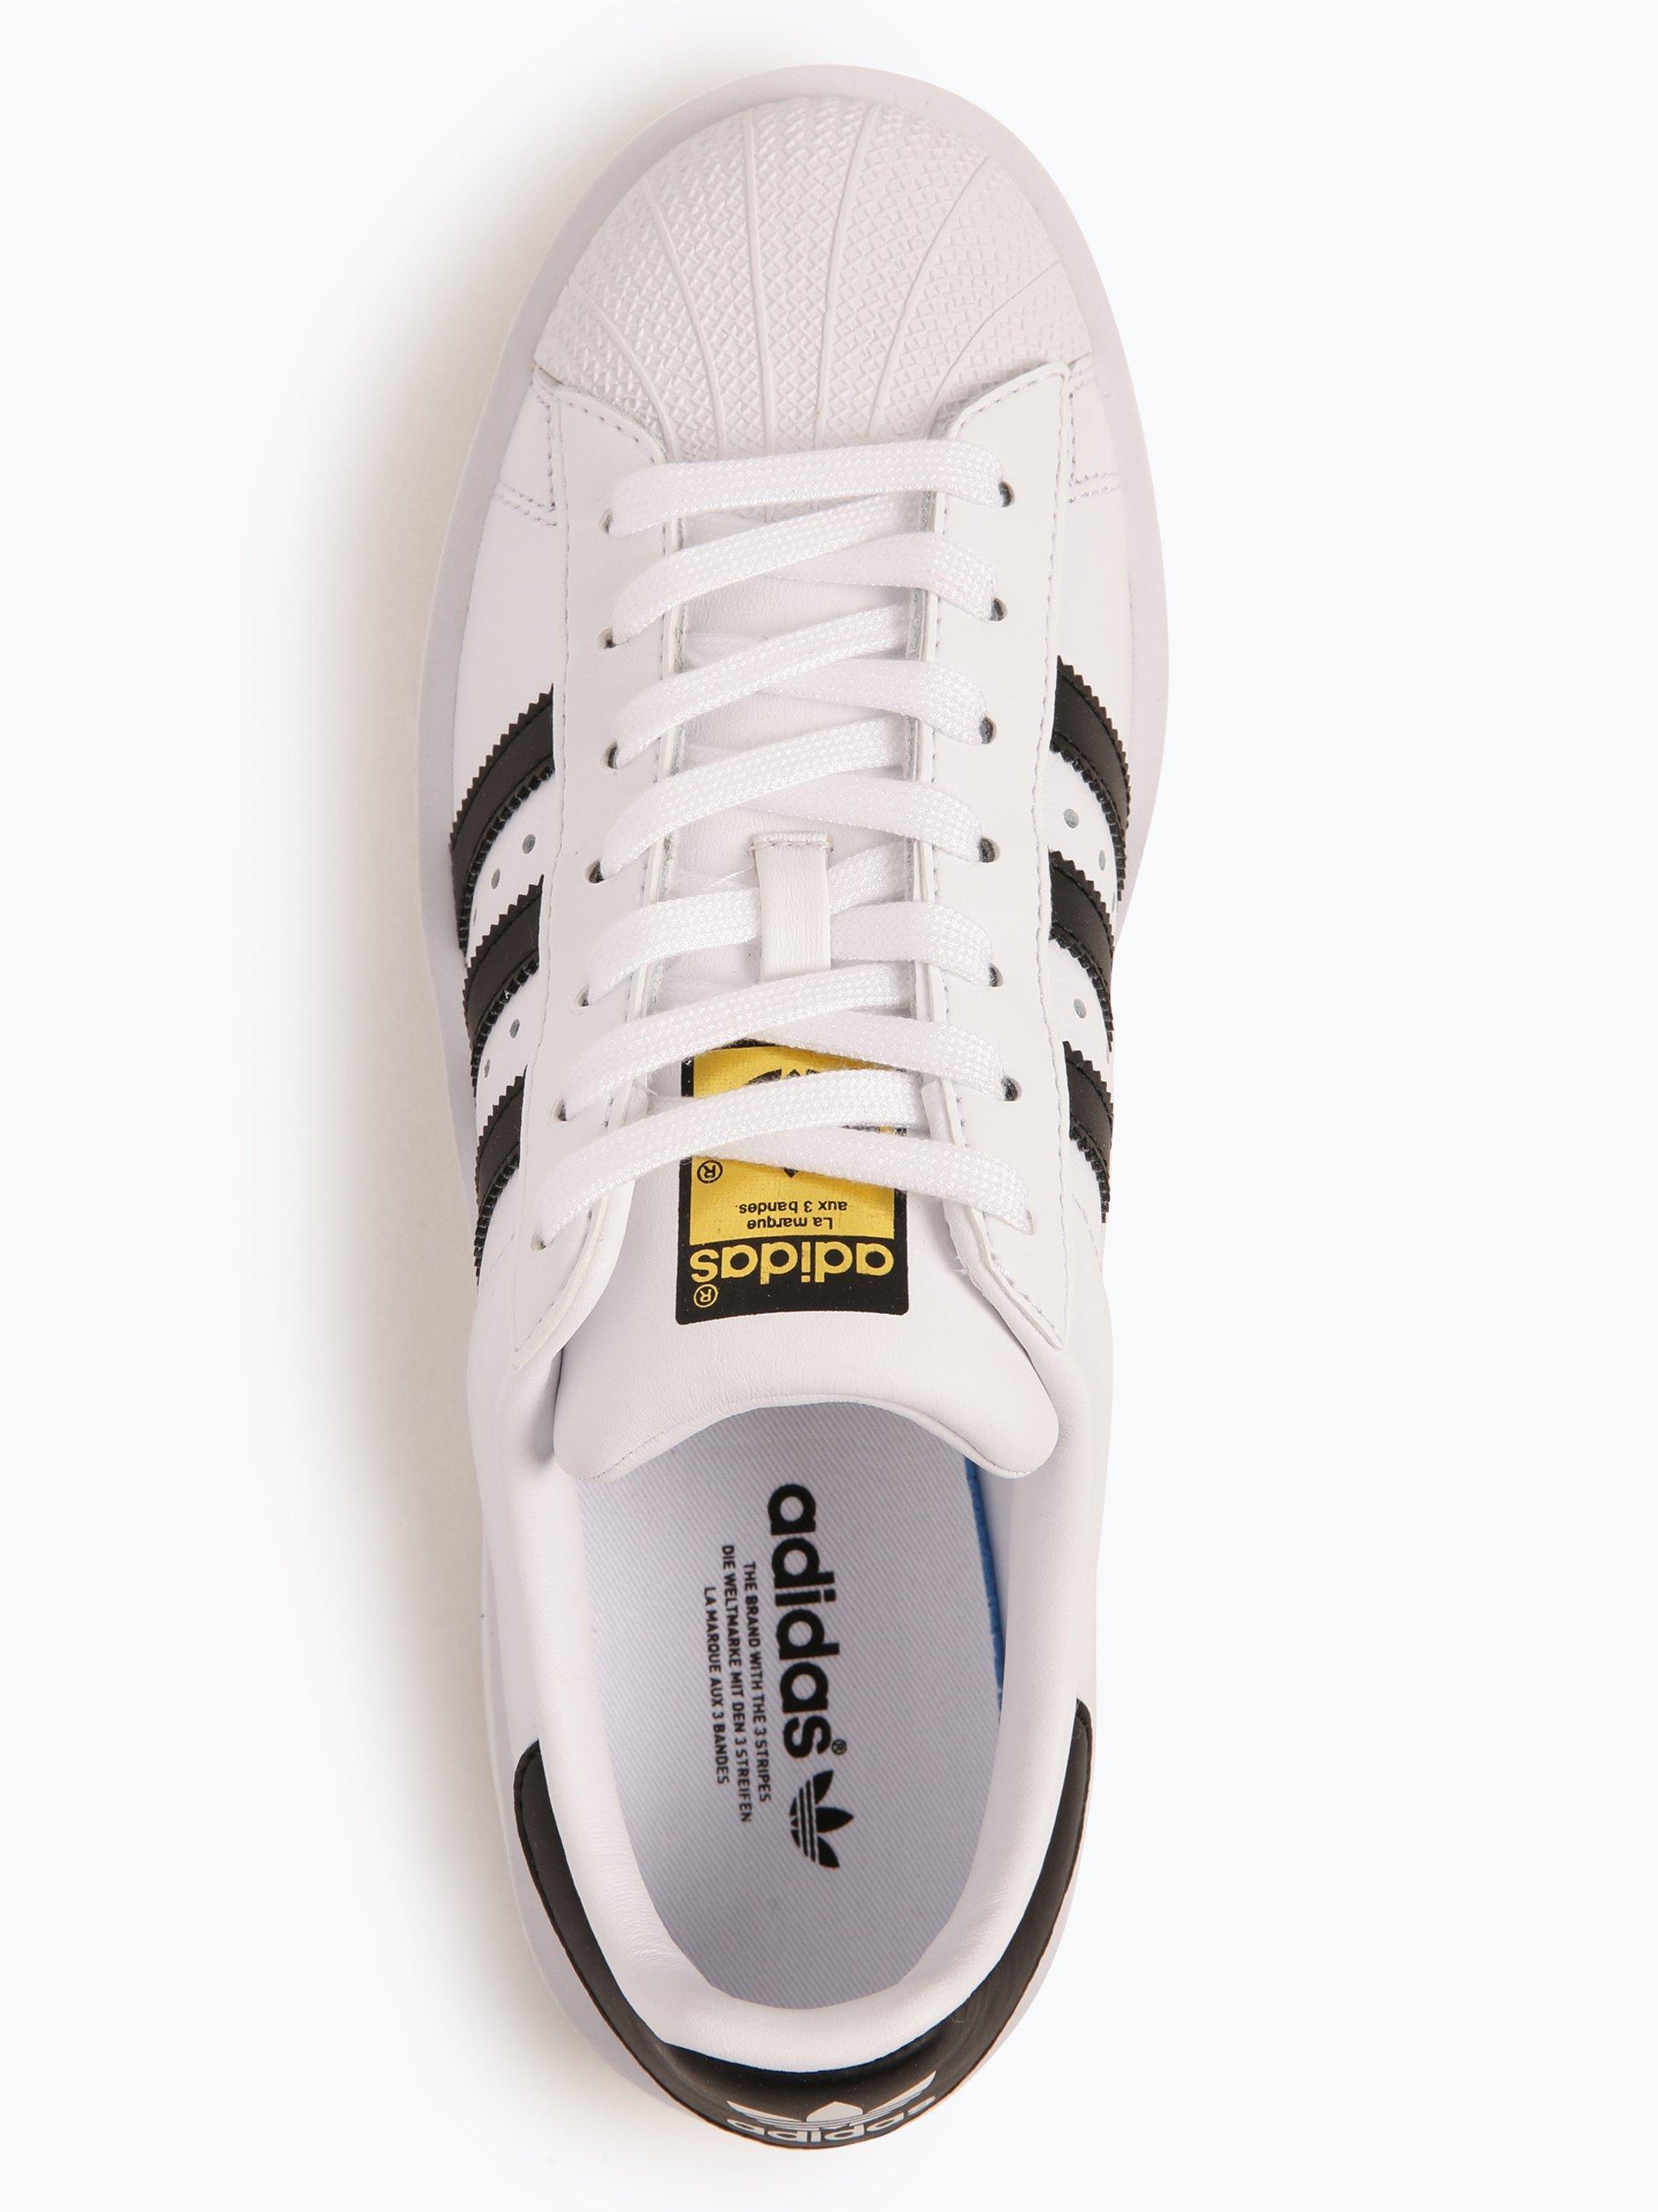 adidas Originals Damen Sneaker mit Leder-Anteil - Superstar Bold